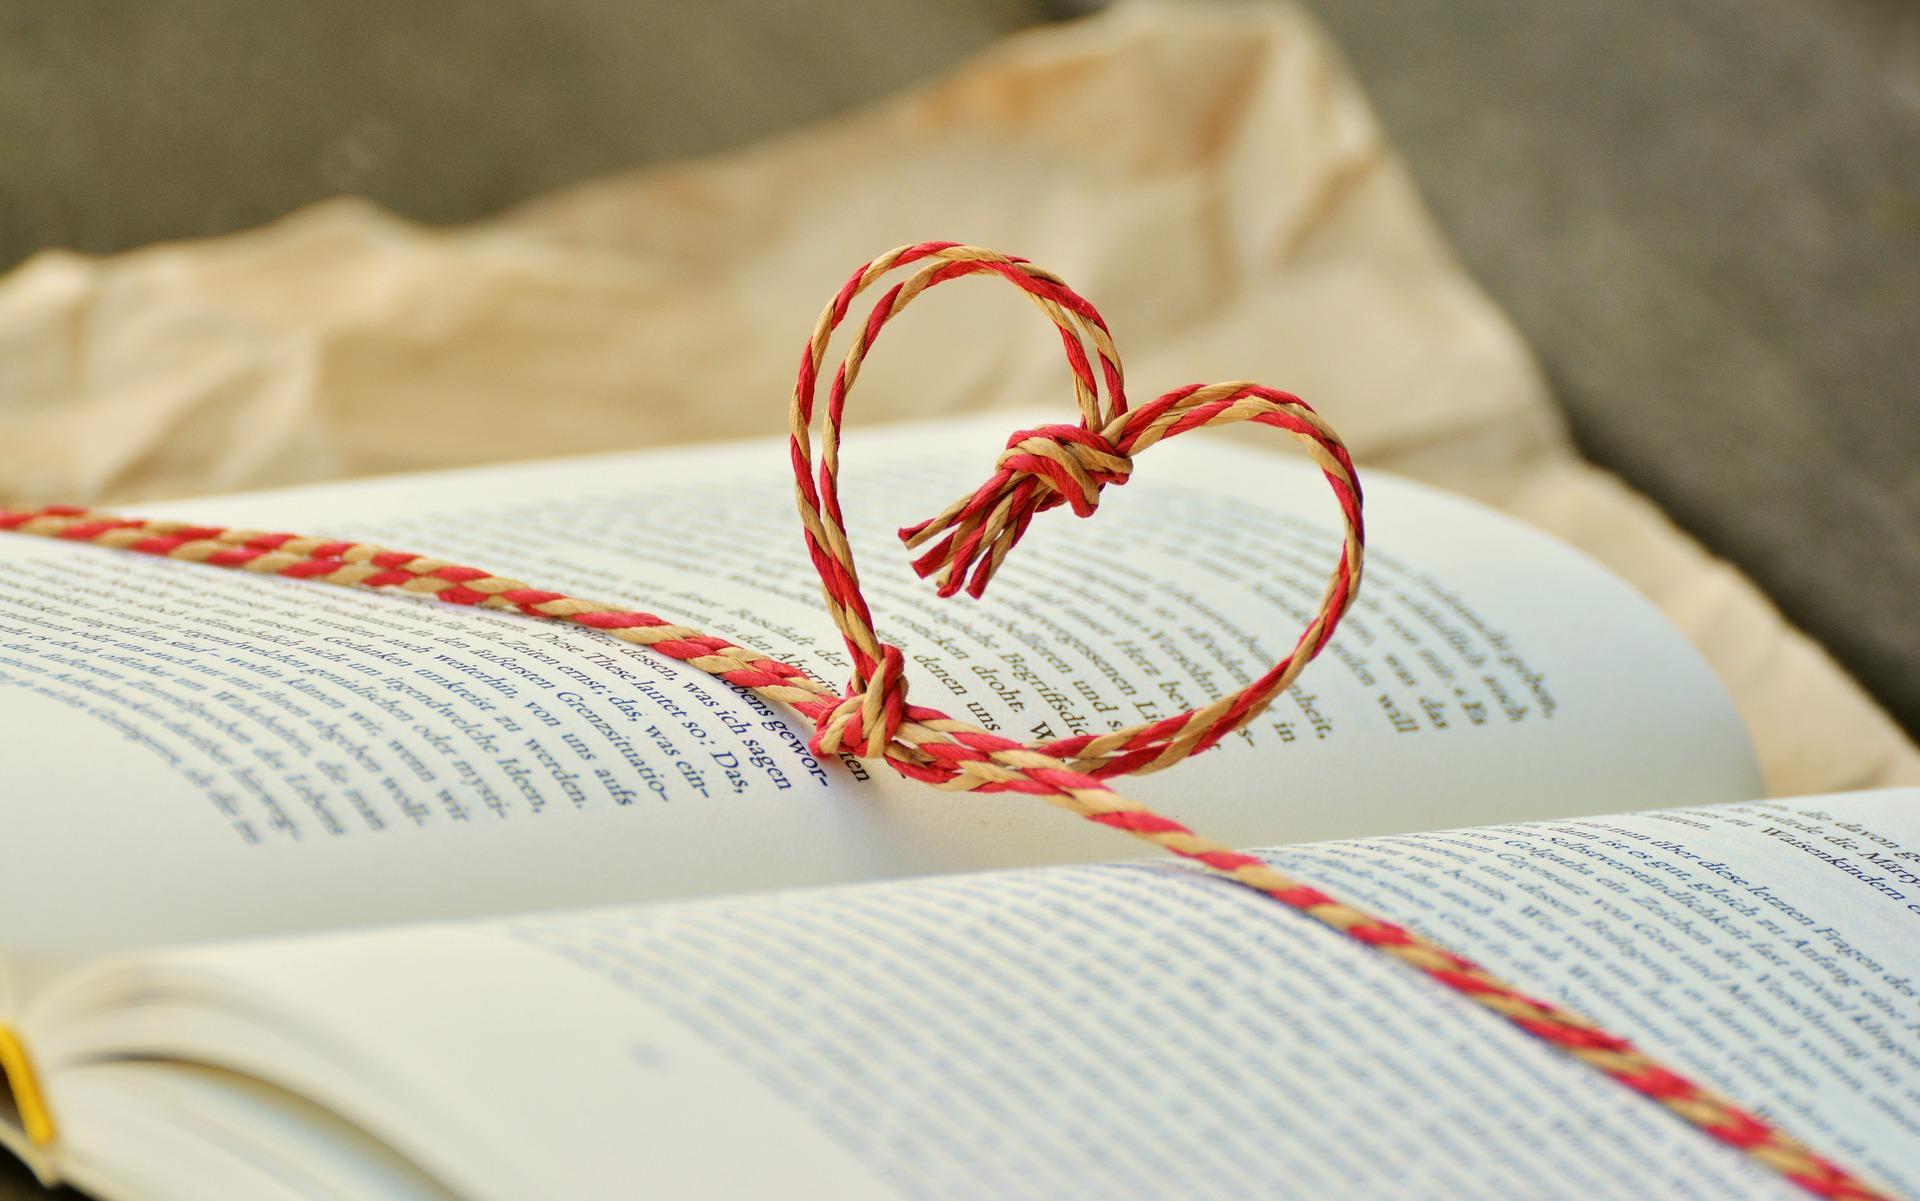 5 Books that Breathe Faith into the Cancer Journey